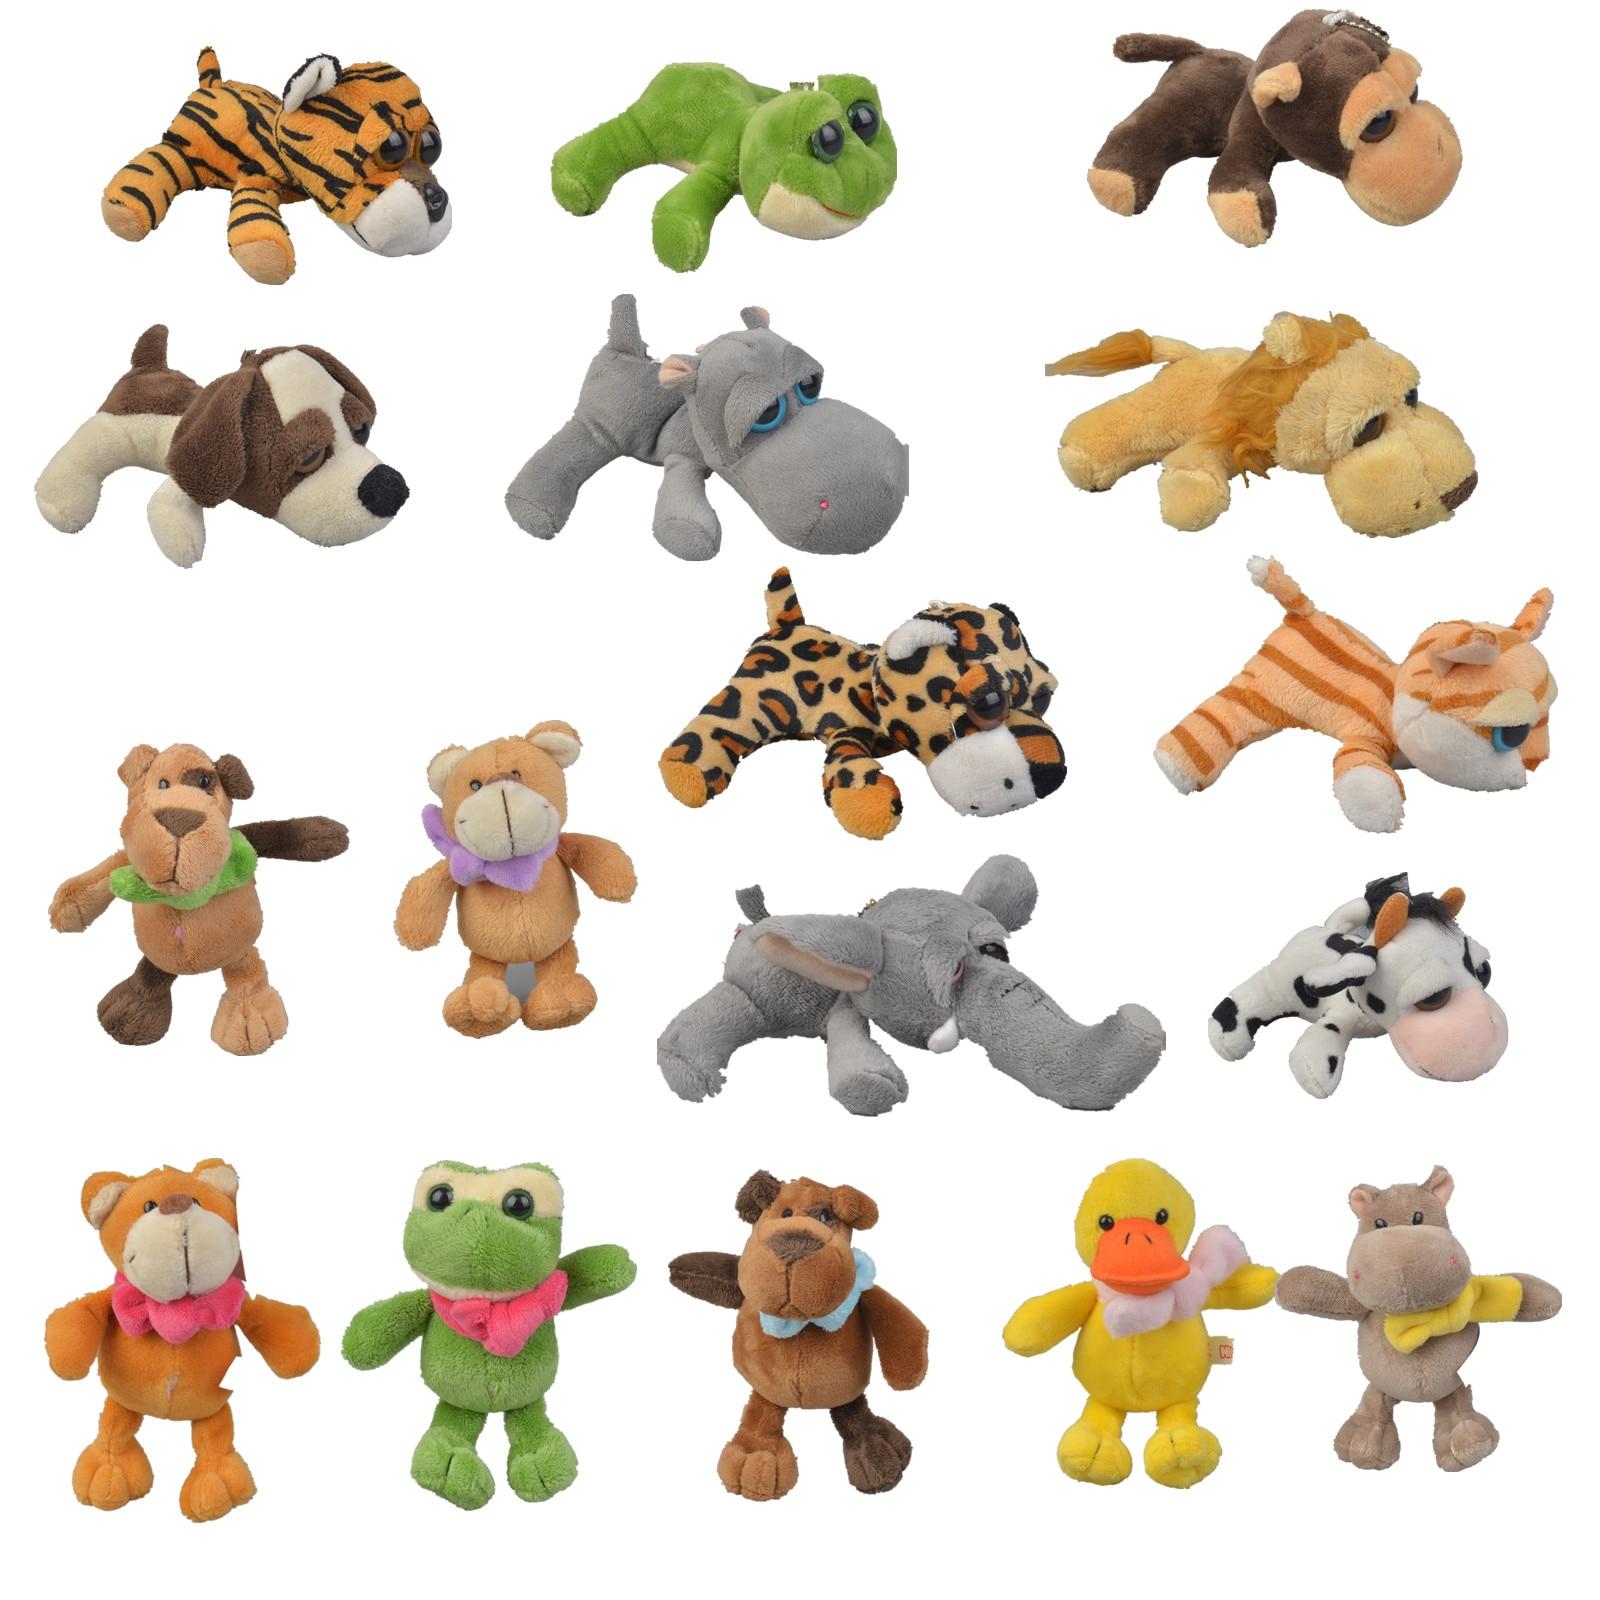 Hot Chuck Plush Toys Sale Frog Duck Lion Popular Elephant Giraffe Monkey Stuffed Doll Jungle Series Stuffed Animal Toys For Kids